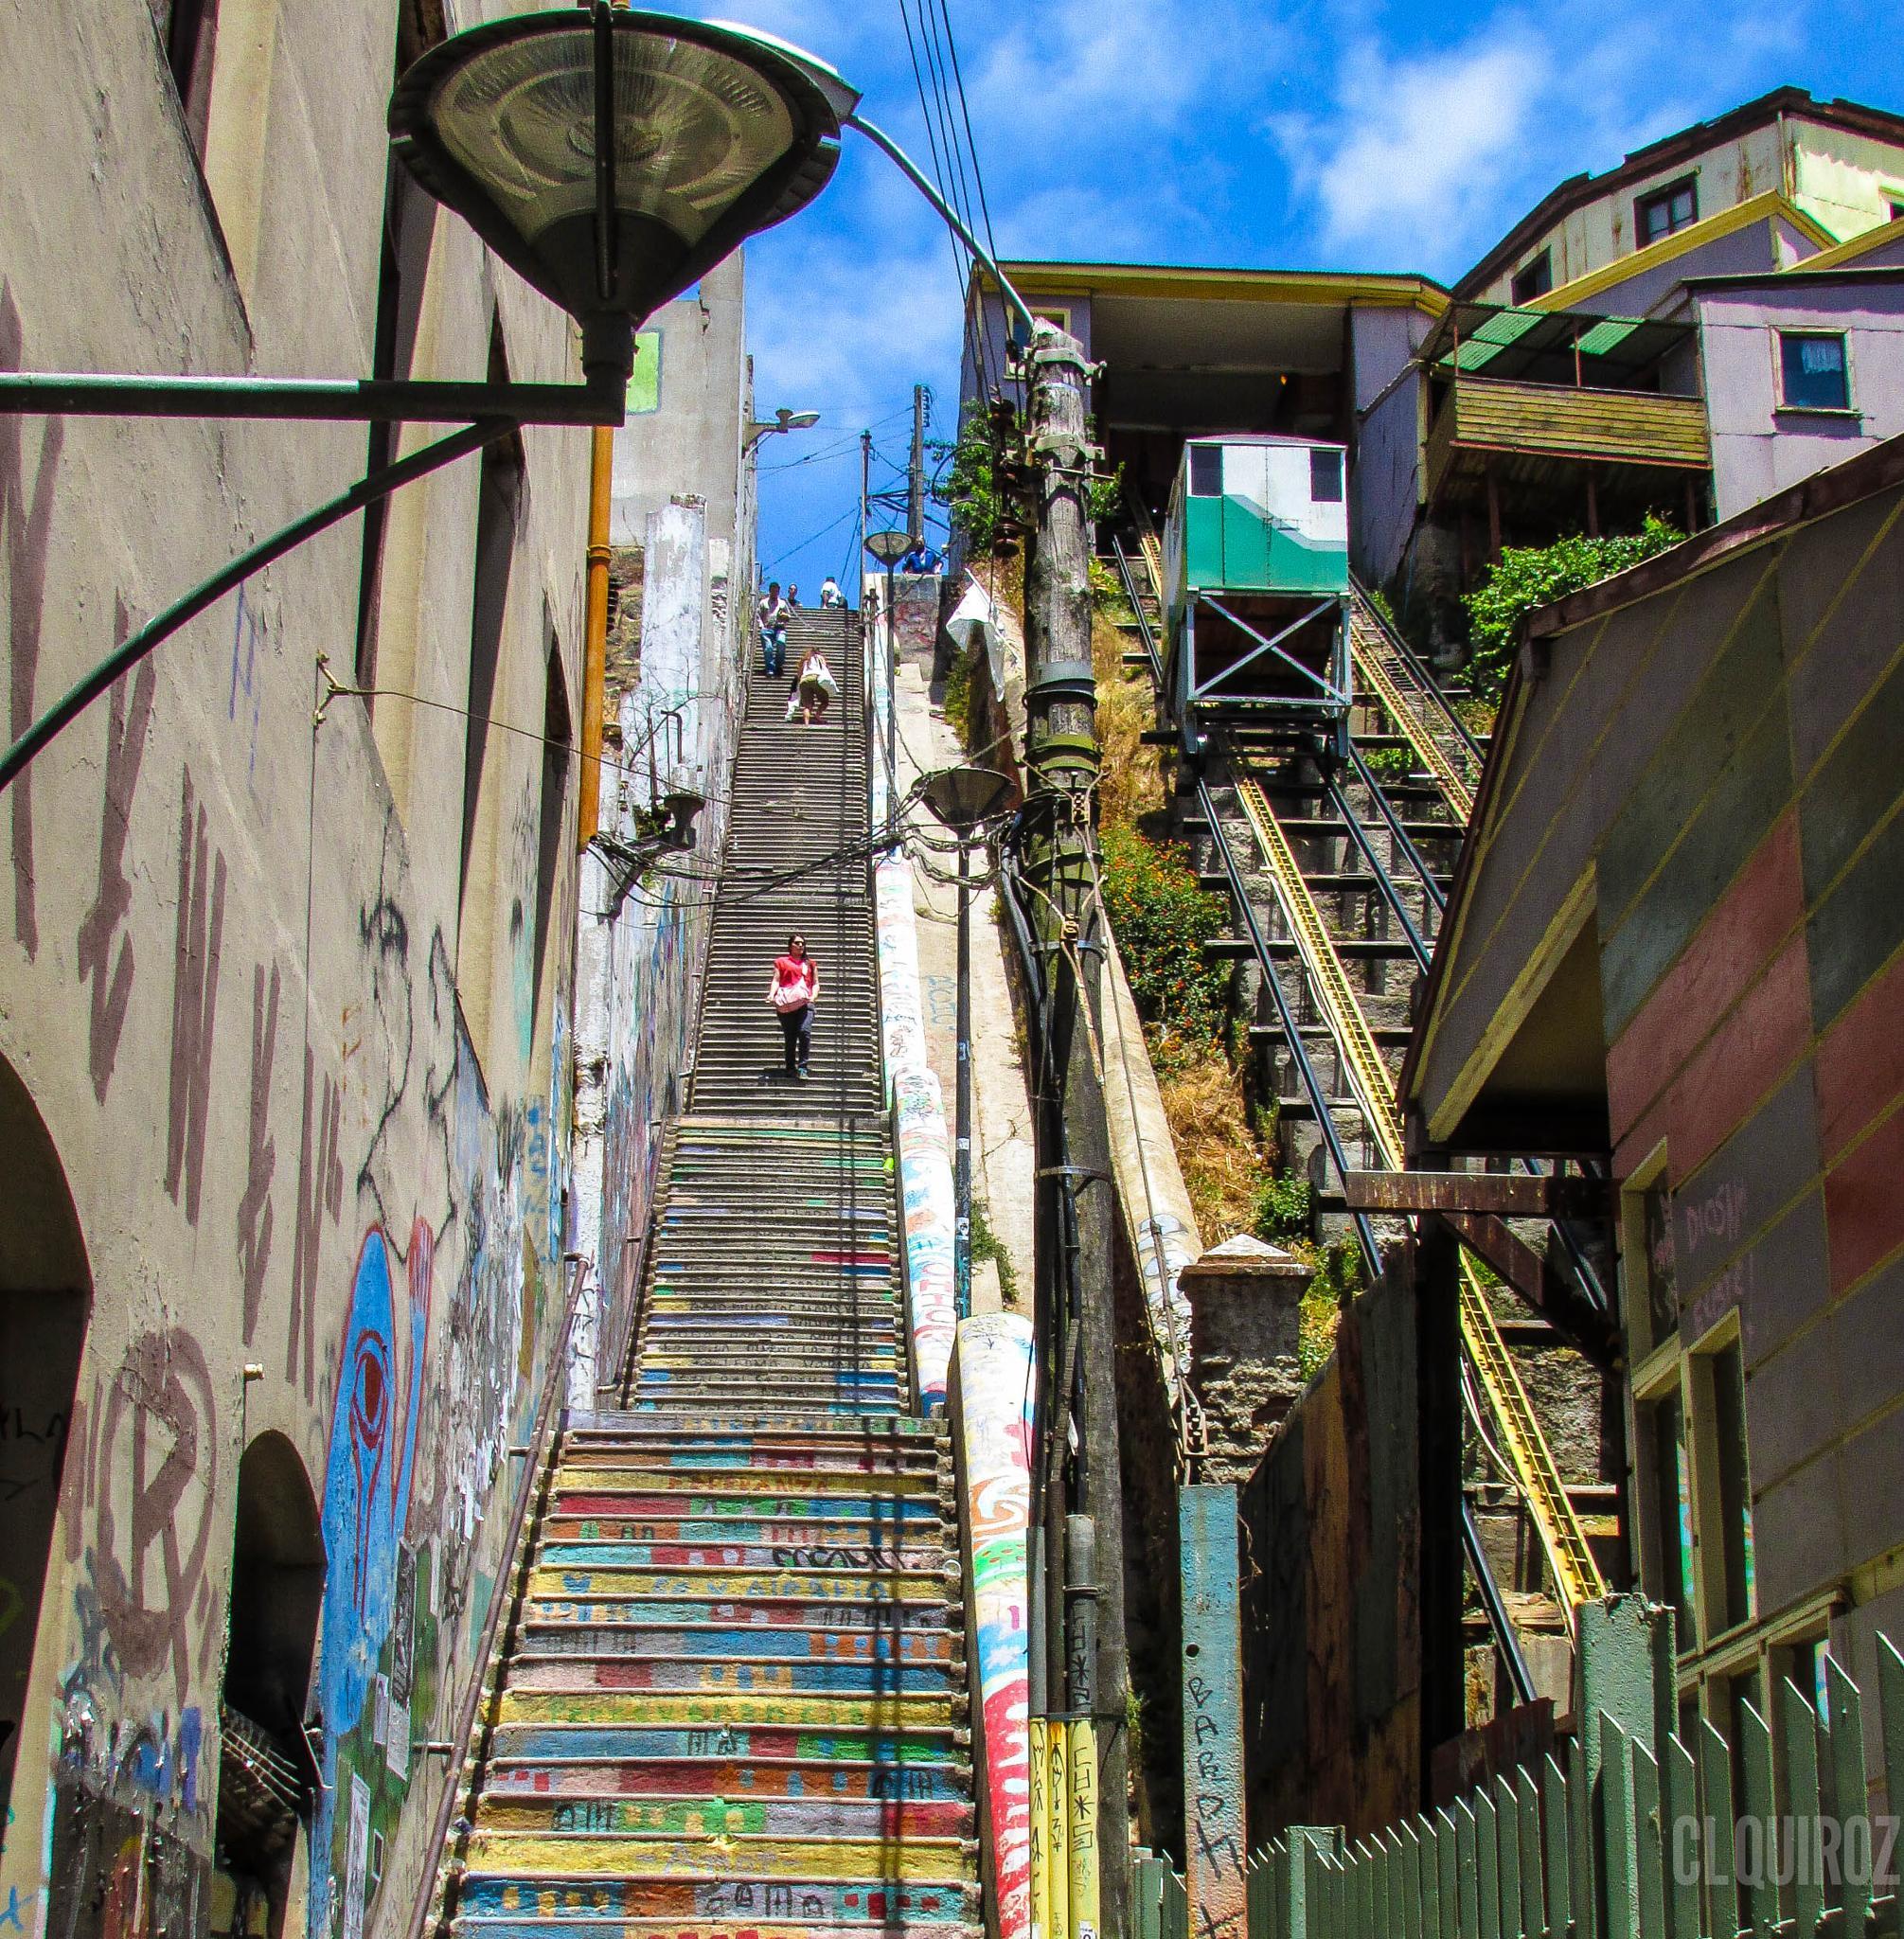 Valparaiso Stairs by Claudio Quiroz C.